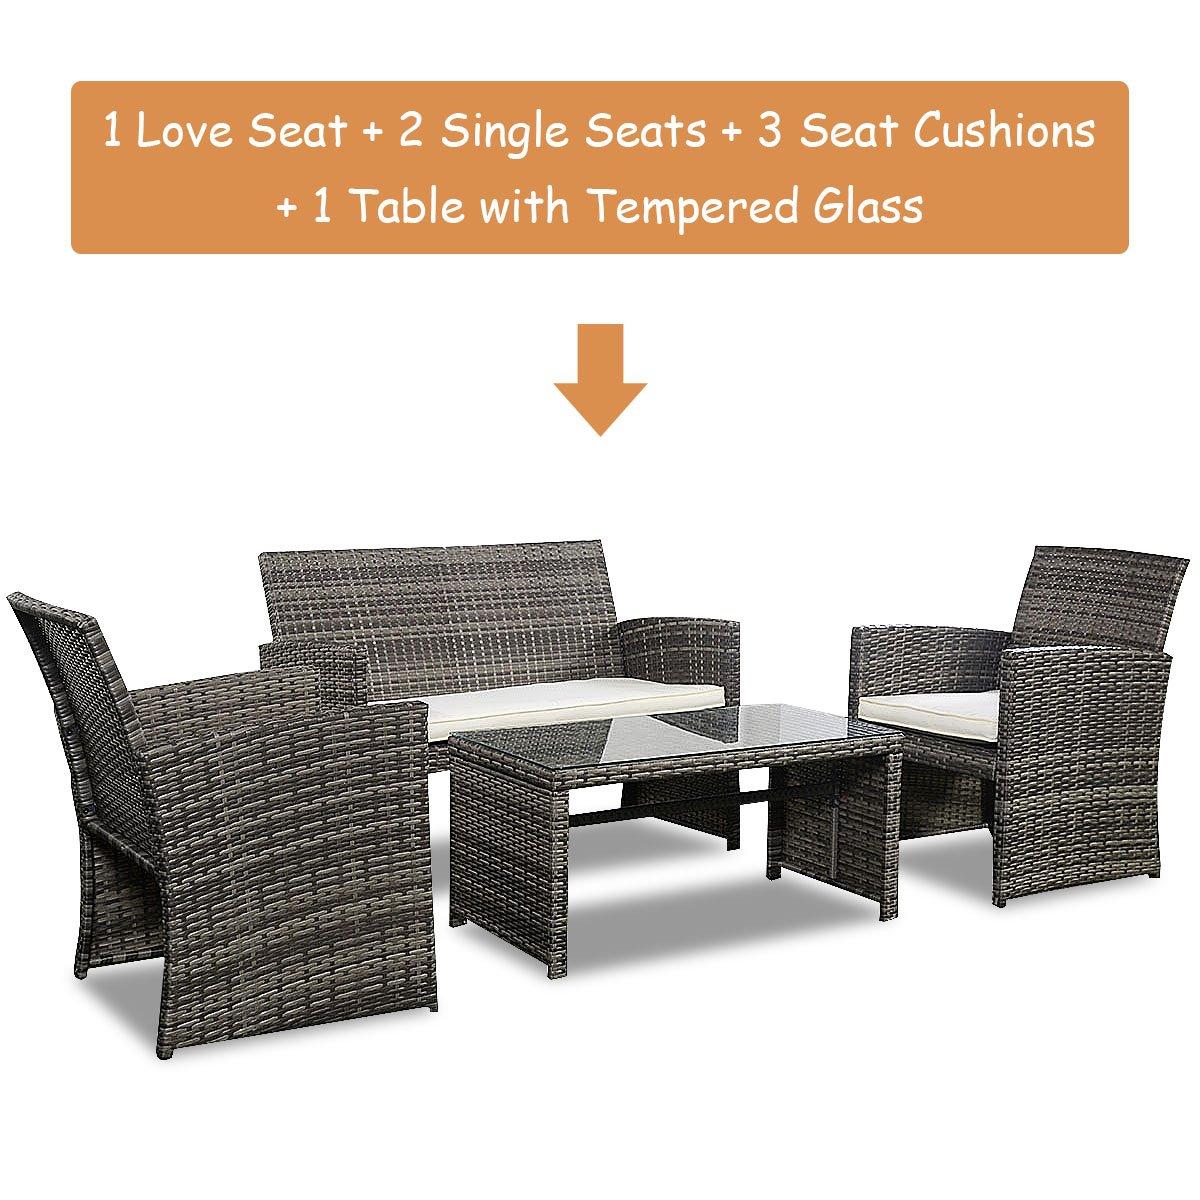 Goplus 4 PC Rattan Patio Furniture Set Garden Lawn Sofa Cushioned Seat Wicker Sofa (Mix Gray)